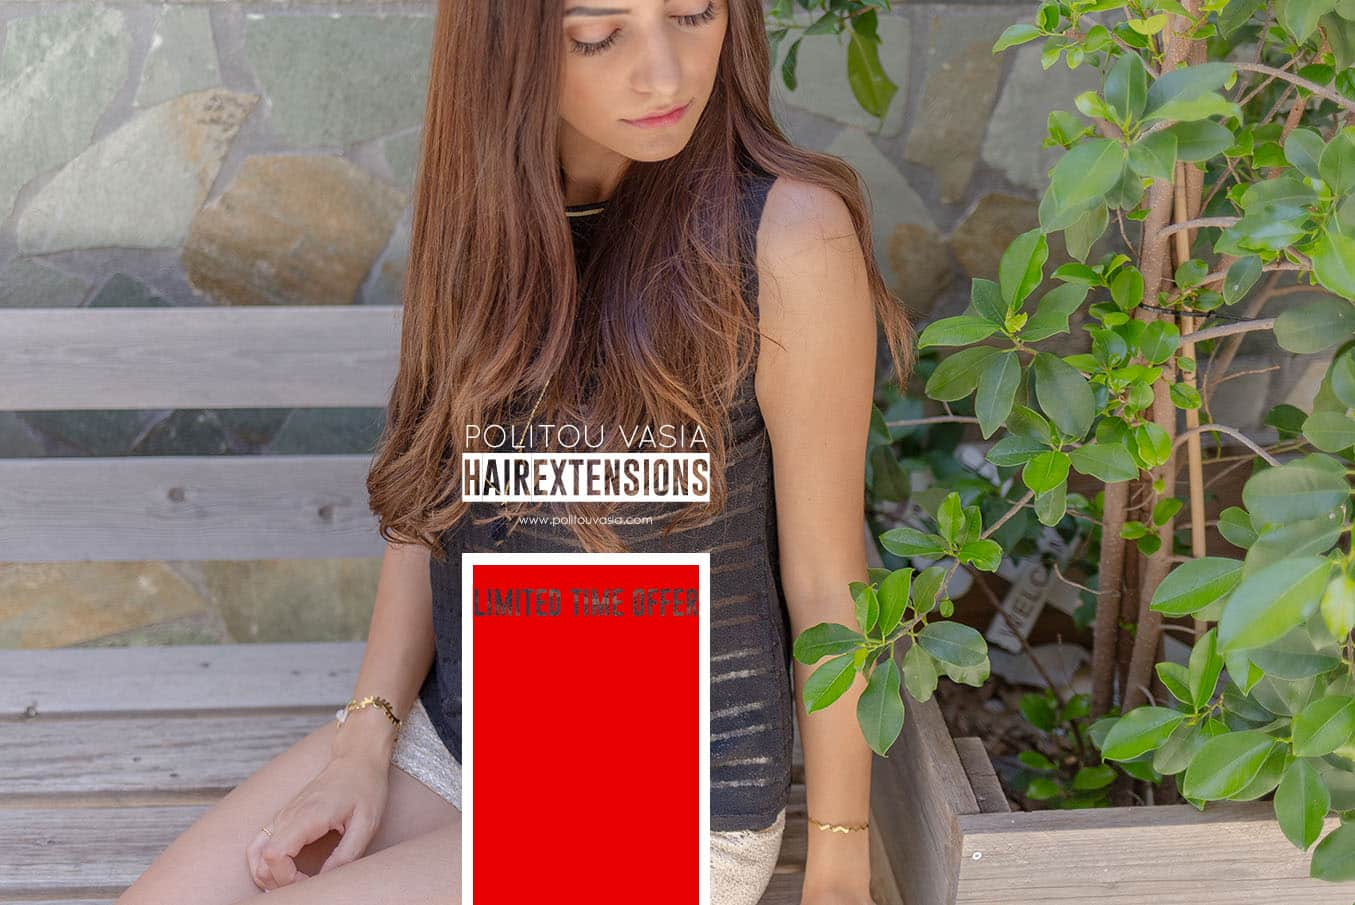 politou vasia blog hair extensions microrings